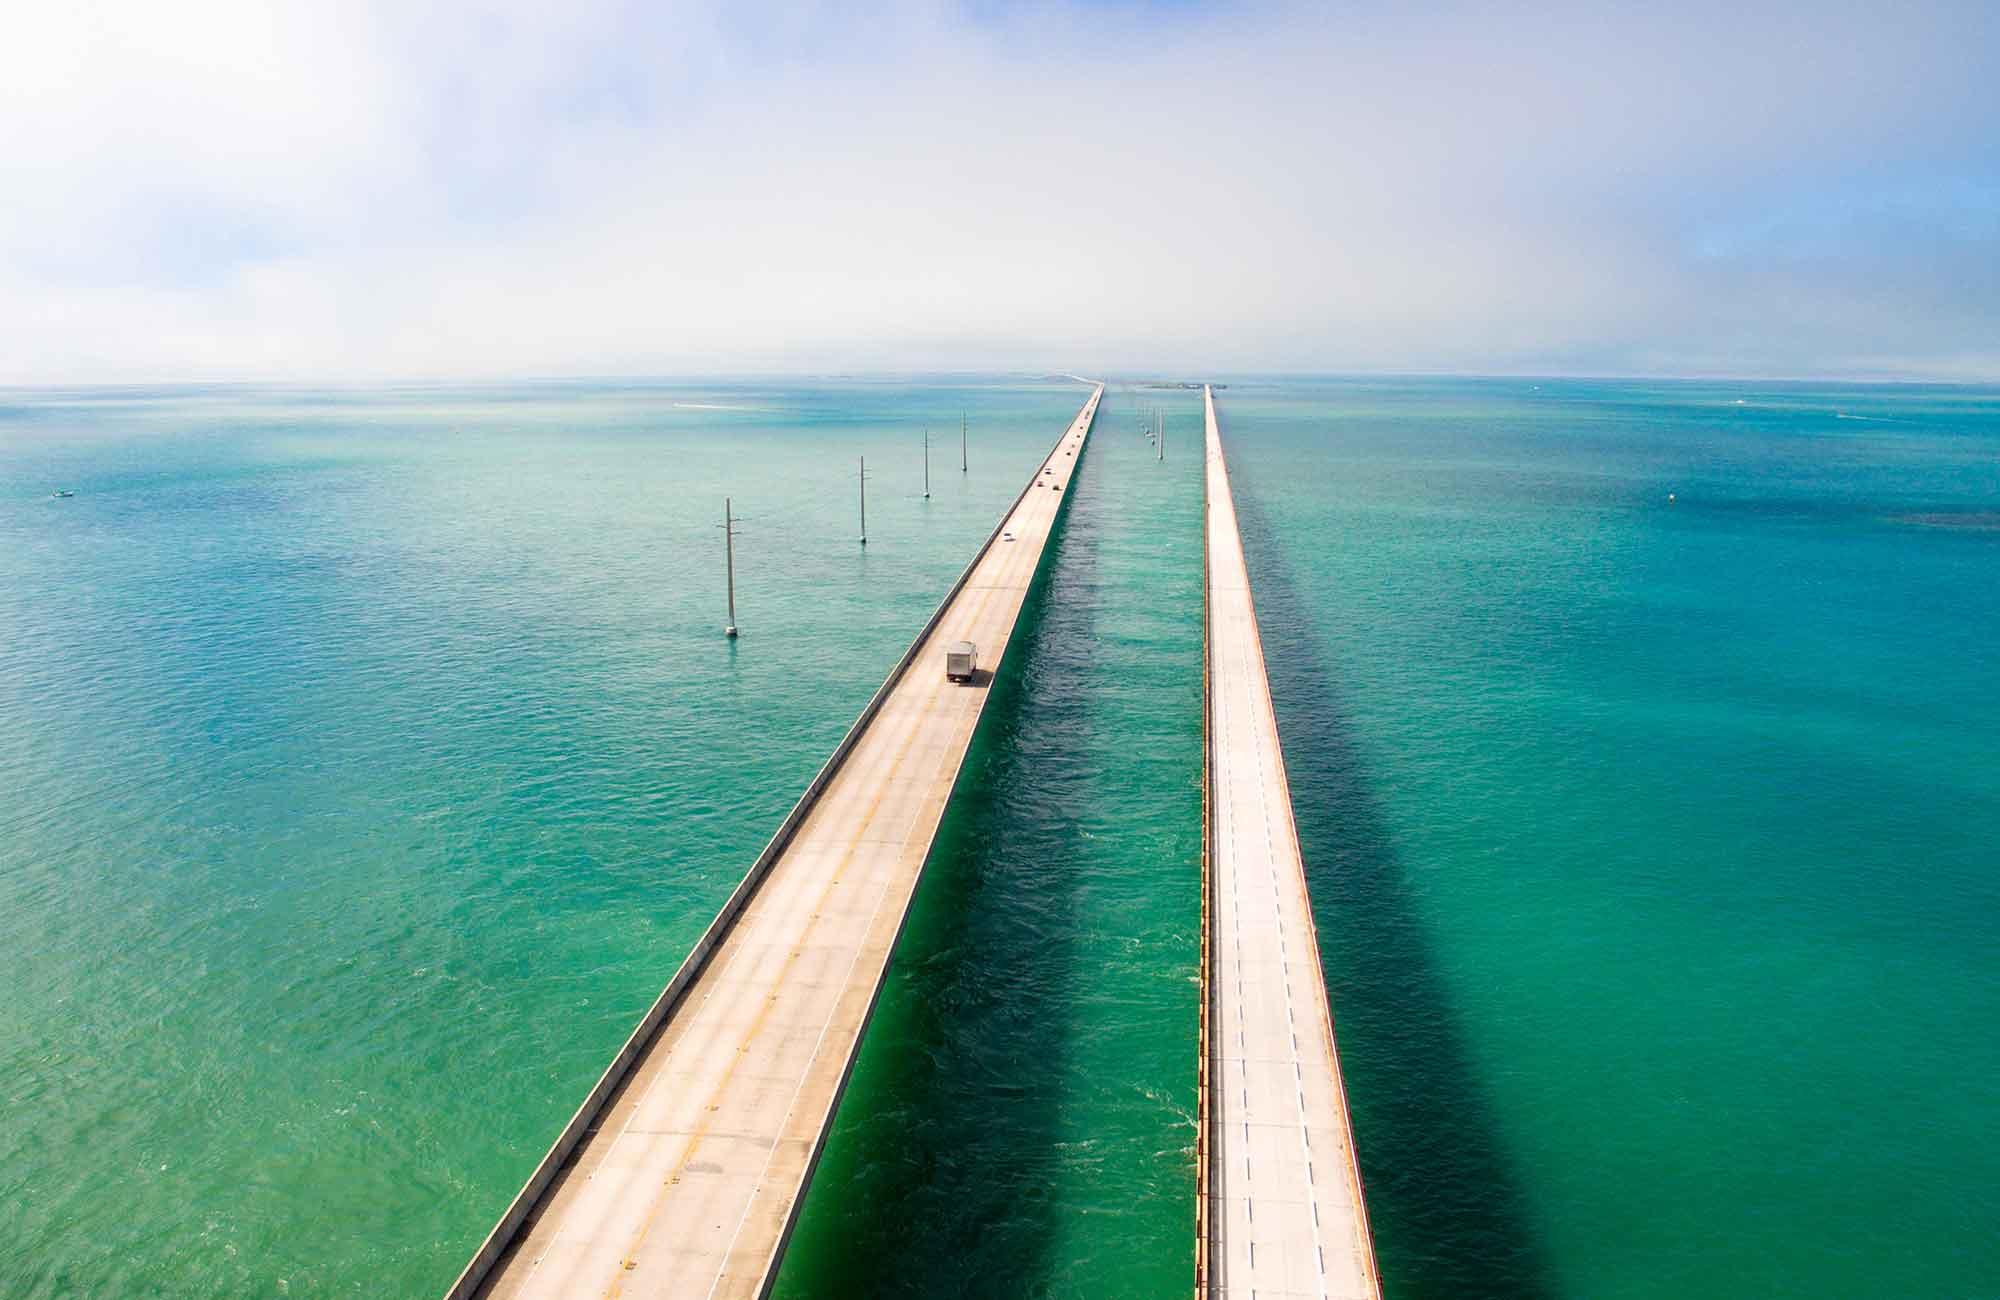 Voyage Etats-Unis - Overseas Highway Floride - Amplitudes